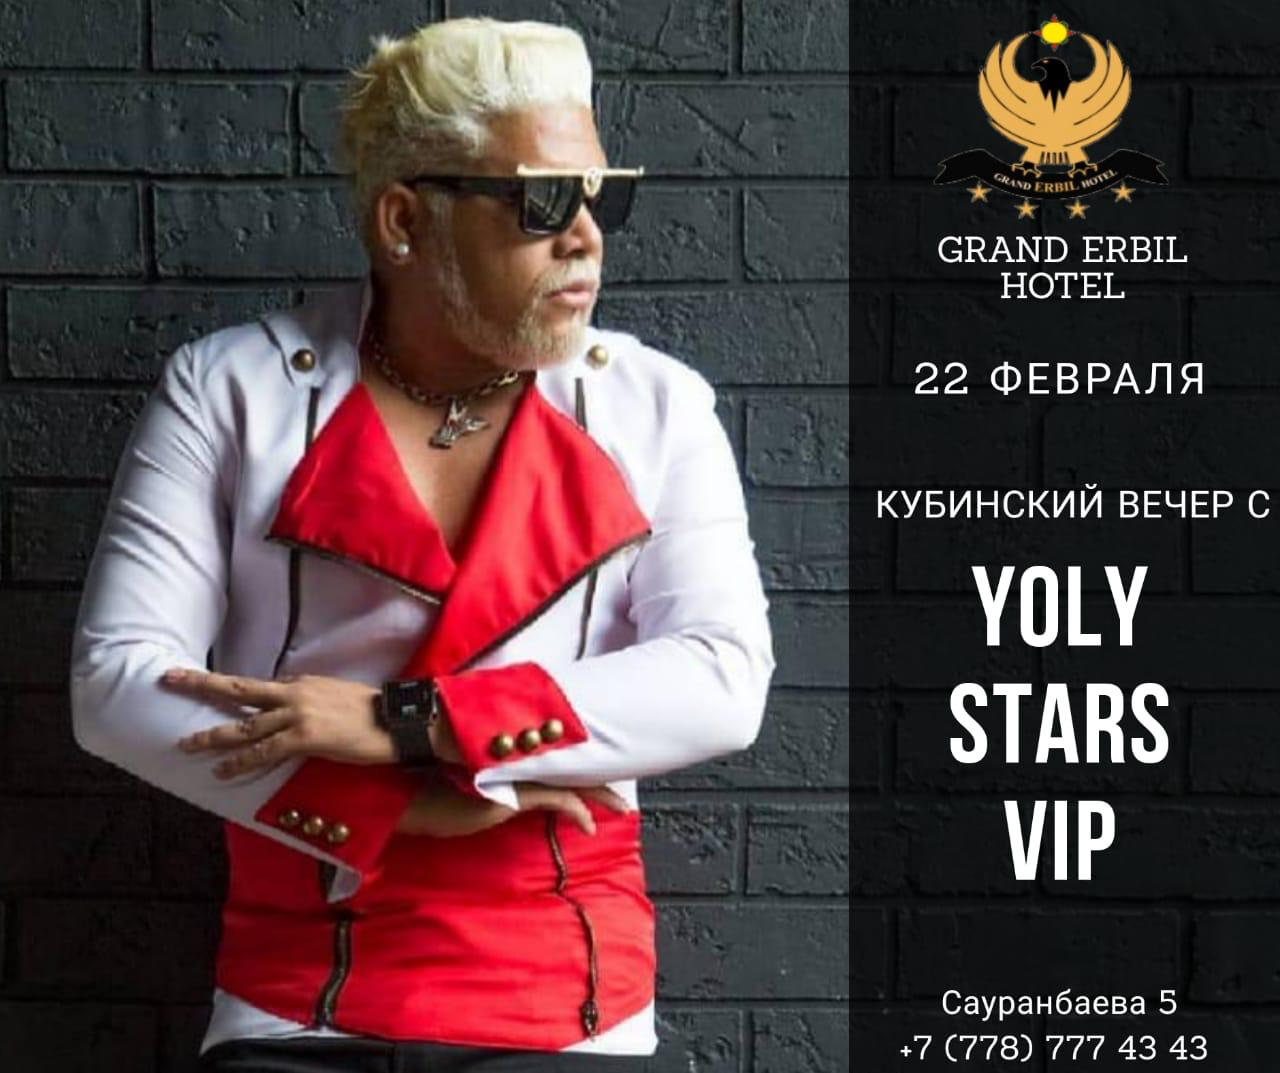 Кубинский вечер с YOLY STARS VIP 22 февраля